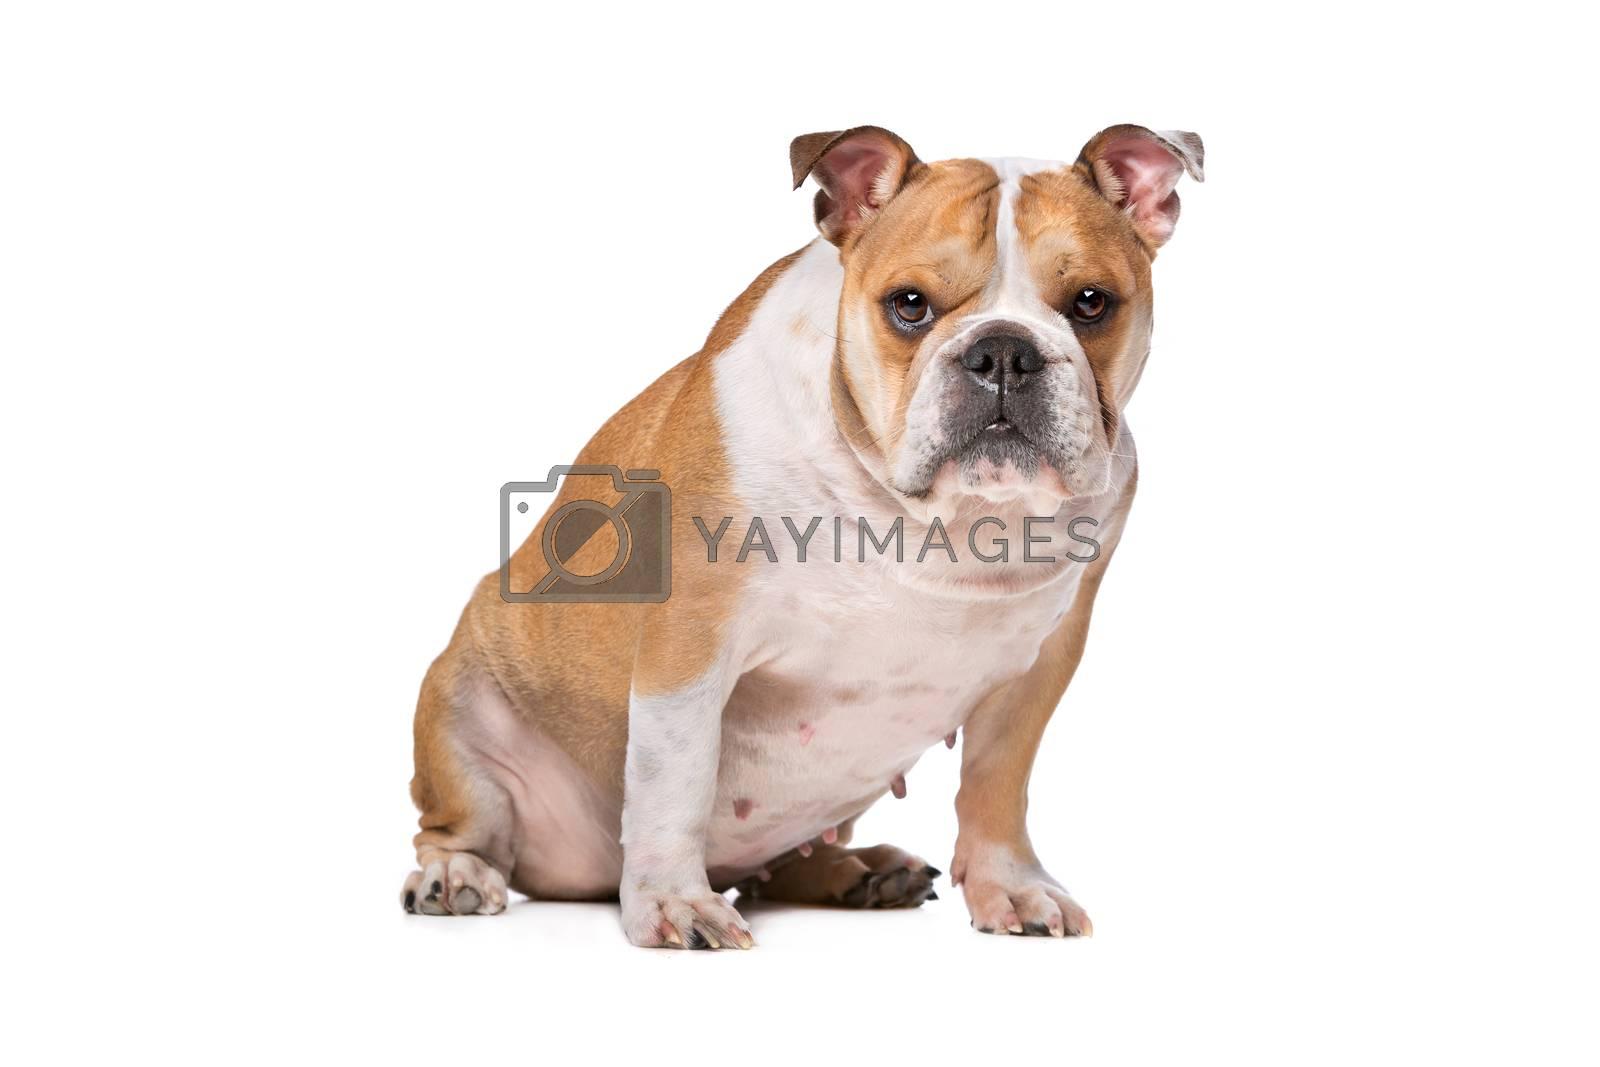 Royalty free image of brown and white English Bulldog by eriklam